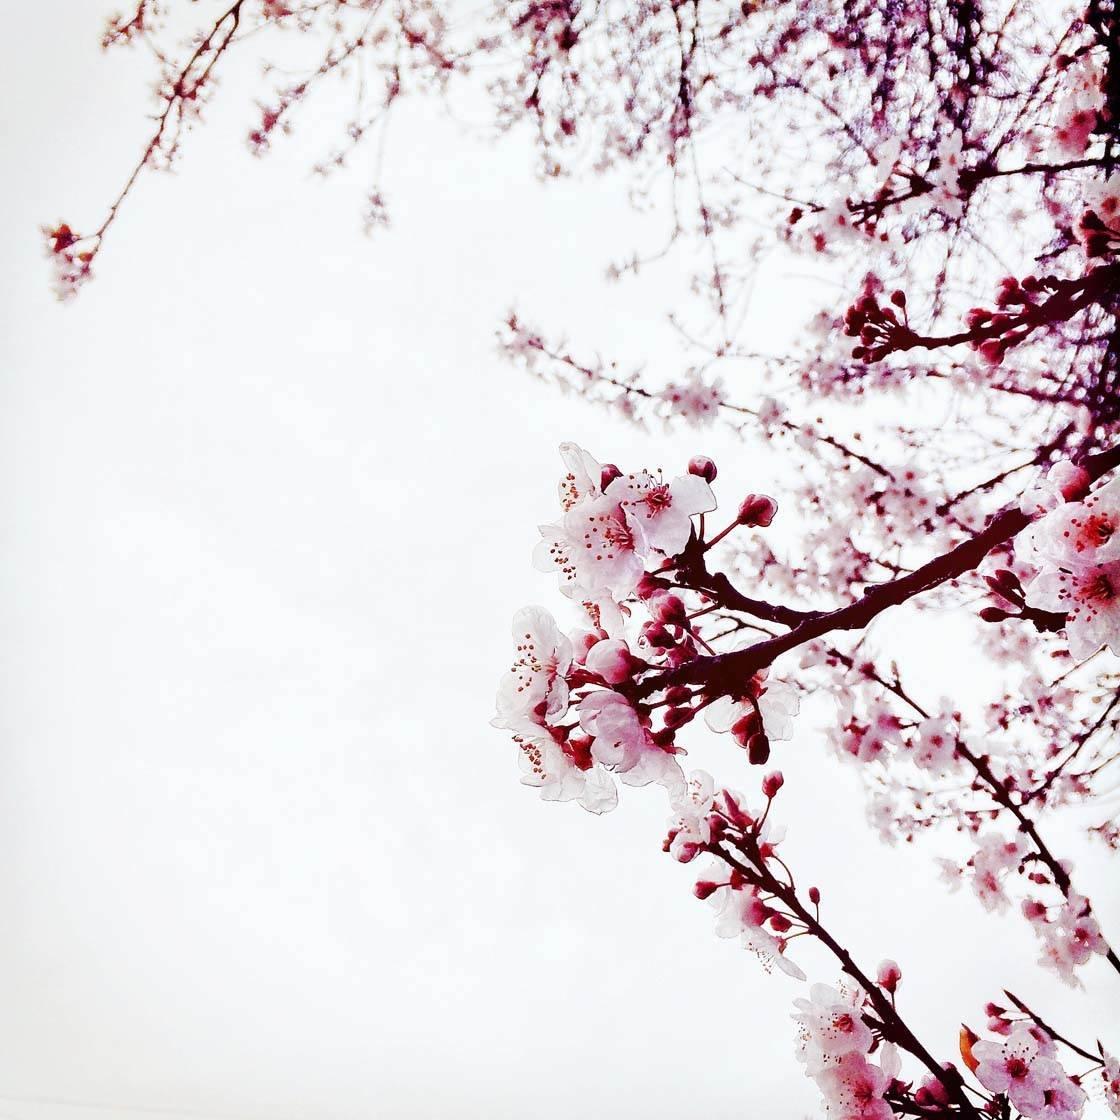 iPhone Flower Photography 8 no script